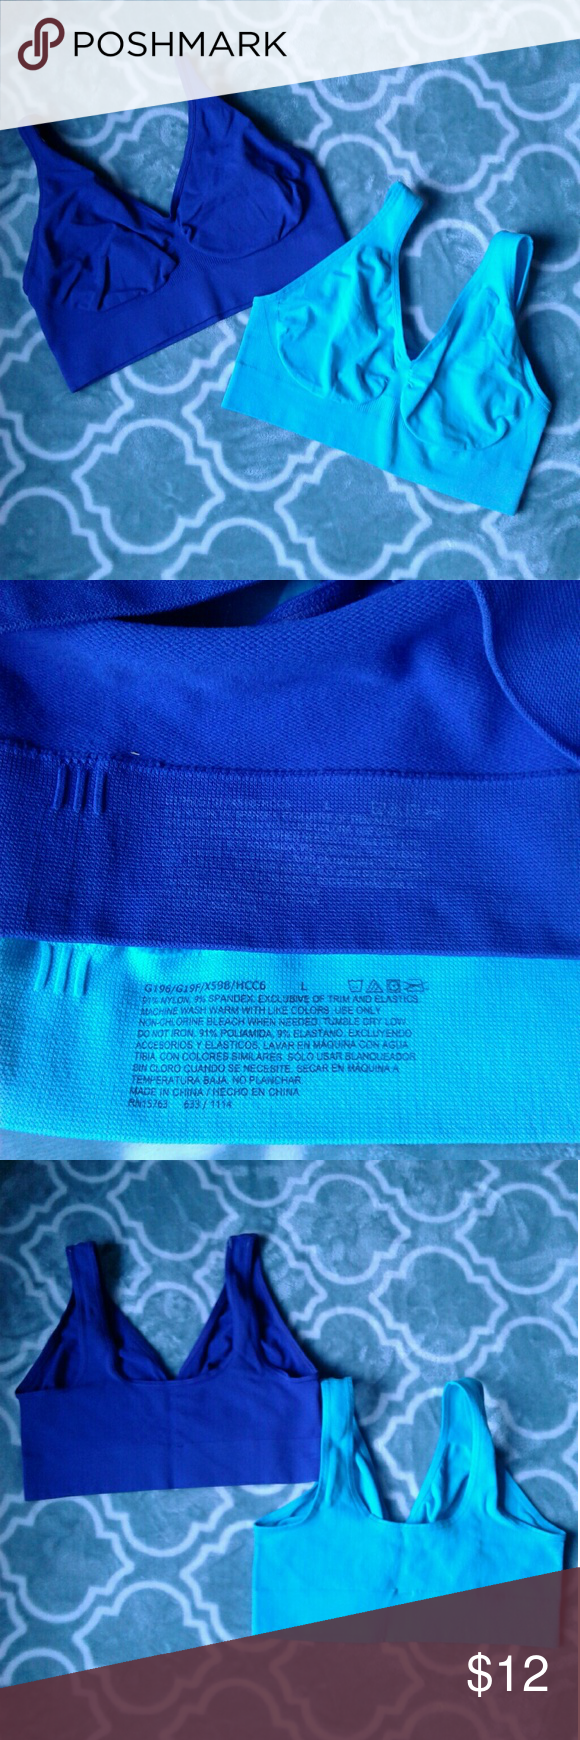 4db4a174d8 💙Bundle💙 Sport Bras Women s like new blue and aqua sport bra bundle size  Large. Thanks for looking!! Intimates   Sleepwear Bras